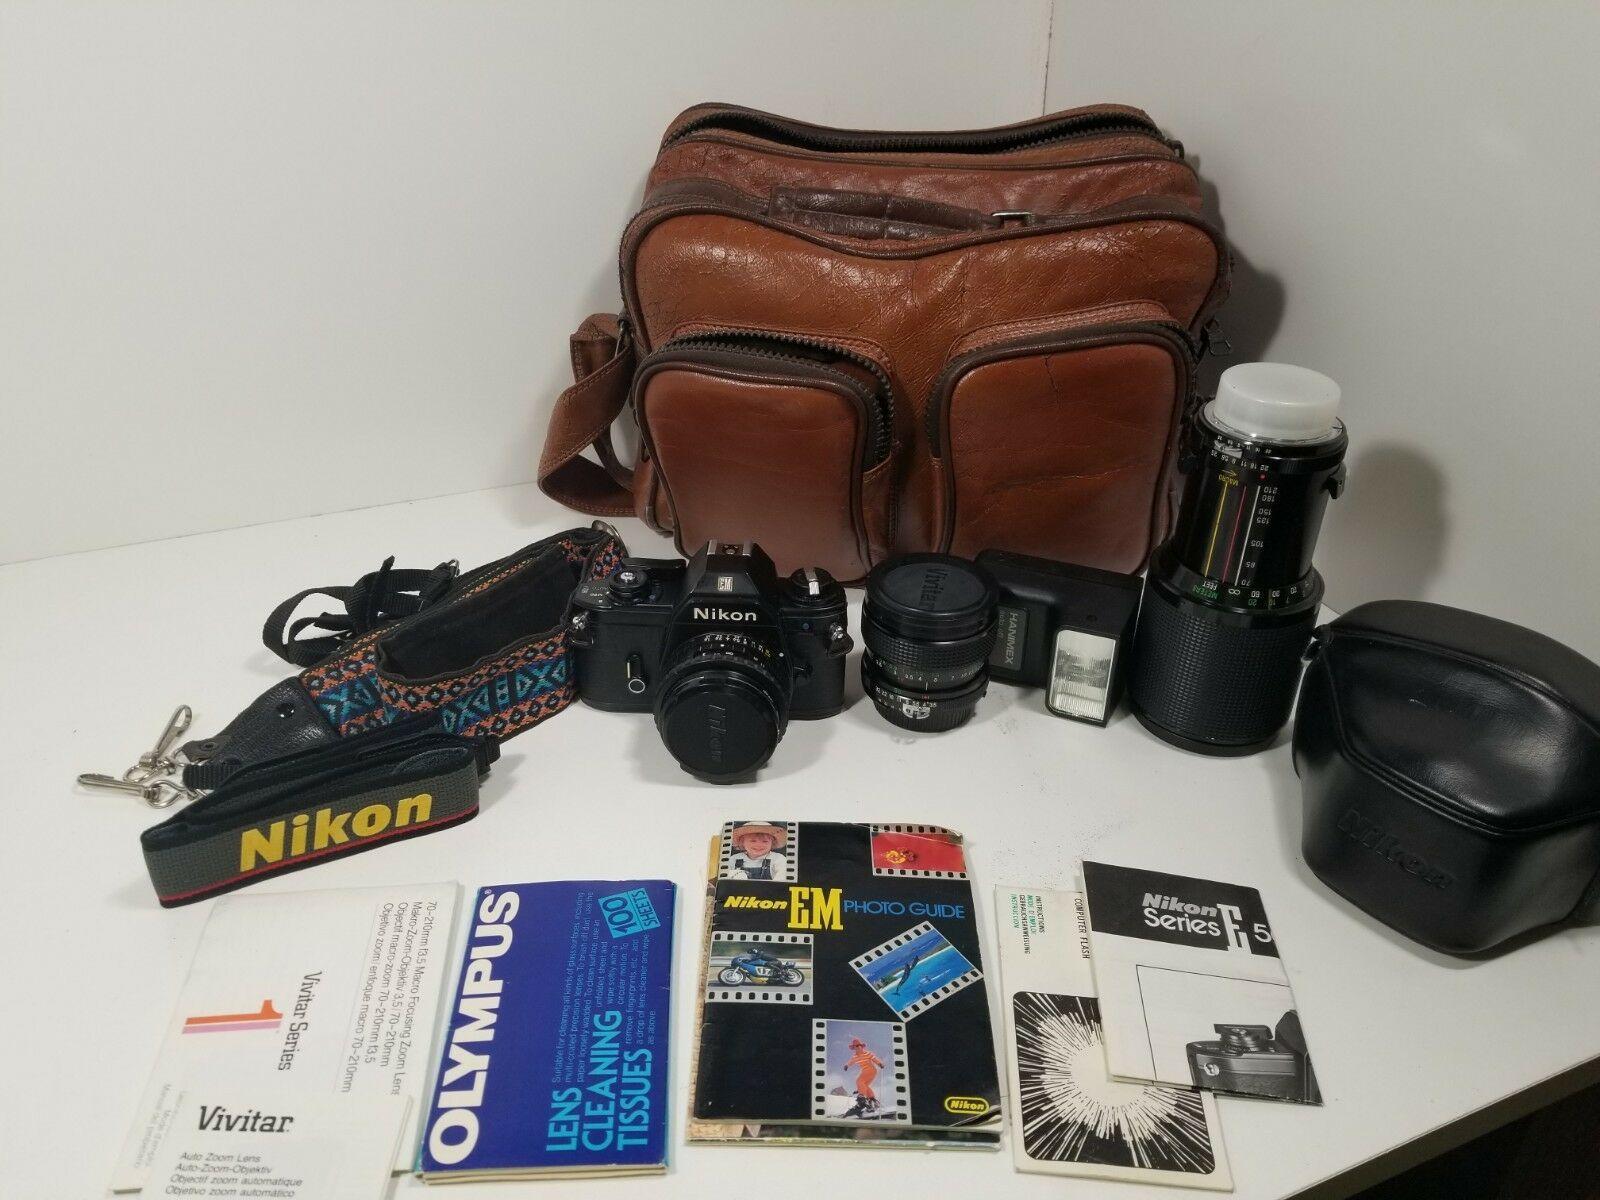 Nikon EM 35MM and 50MM Lens ..Camera and Bag and Vivitar Lenses...